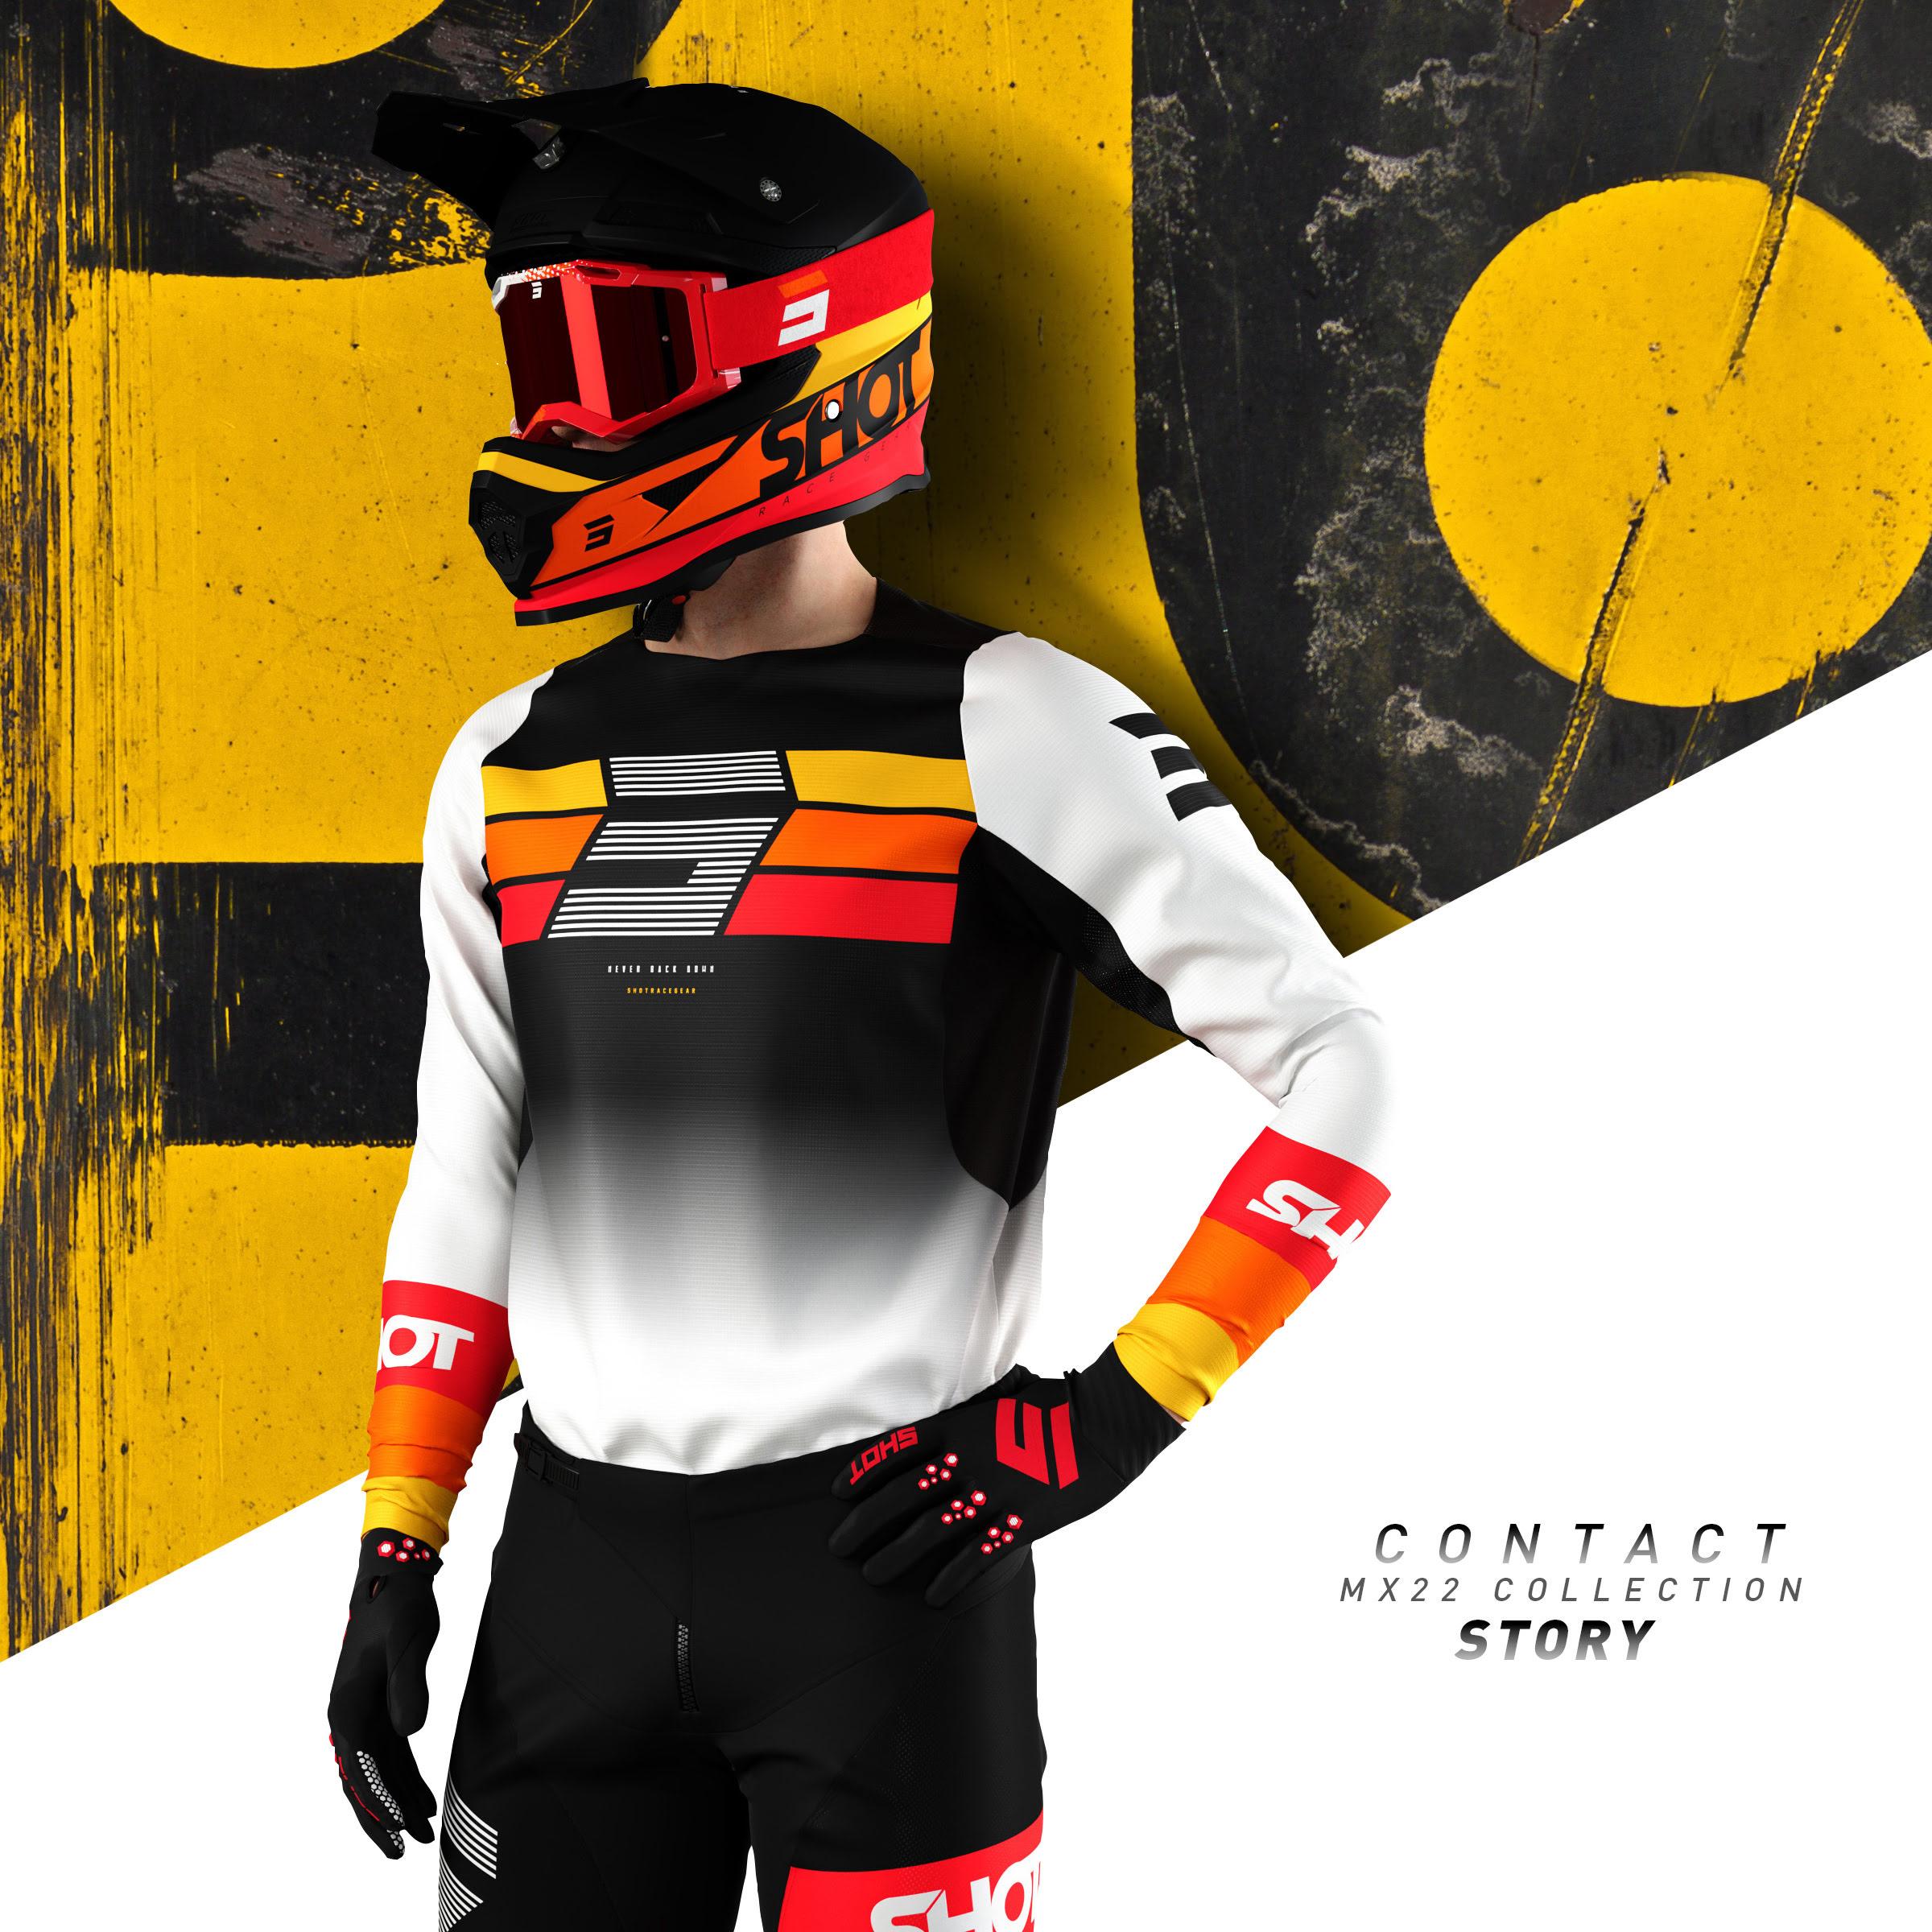 SHOT 2022 - Contact Story